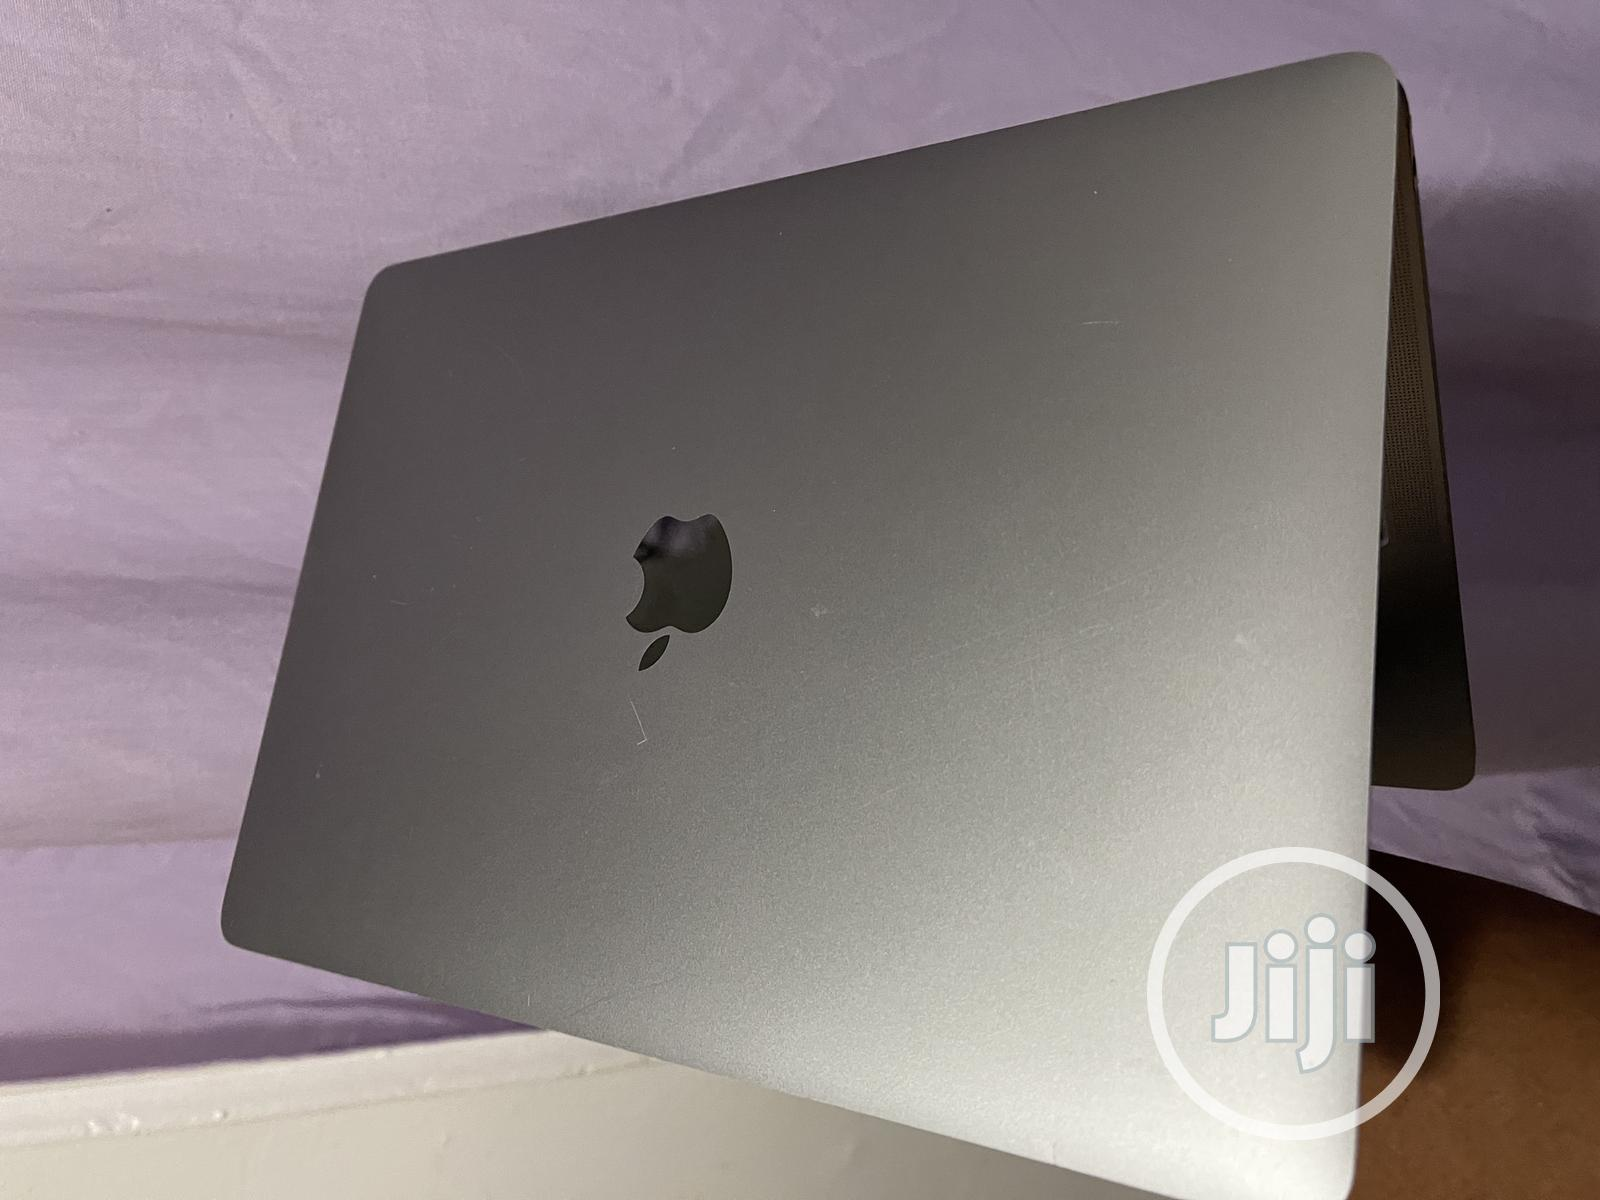 Laptop Apple MacBook Pro 2016 8GB Intel Core I5 SSD 256GB   Laptops & Computers for sale in Ilorin East, Kwara State, Nigeria